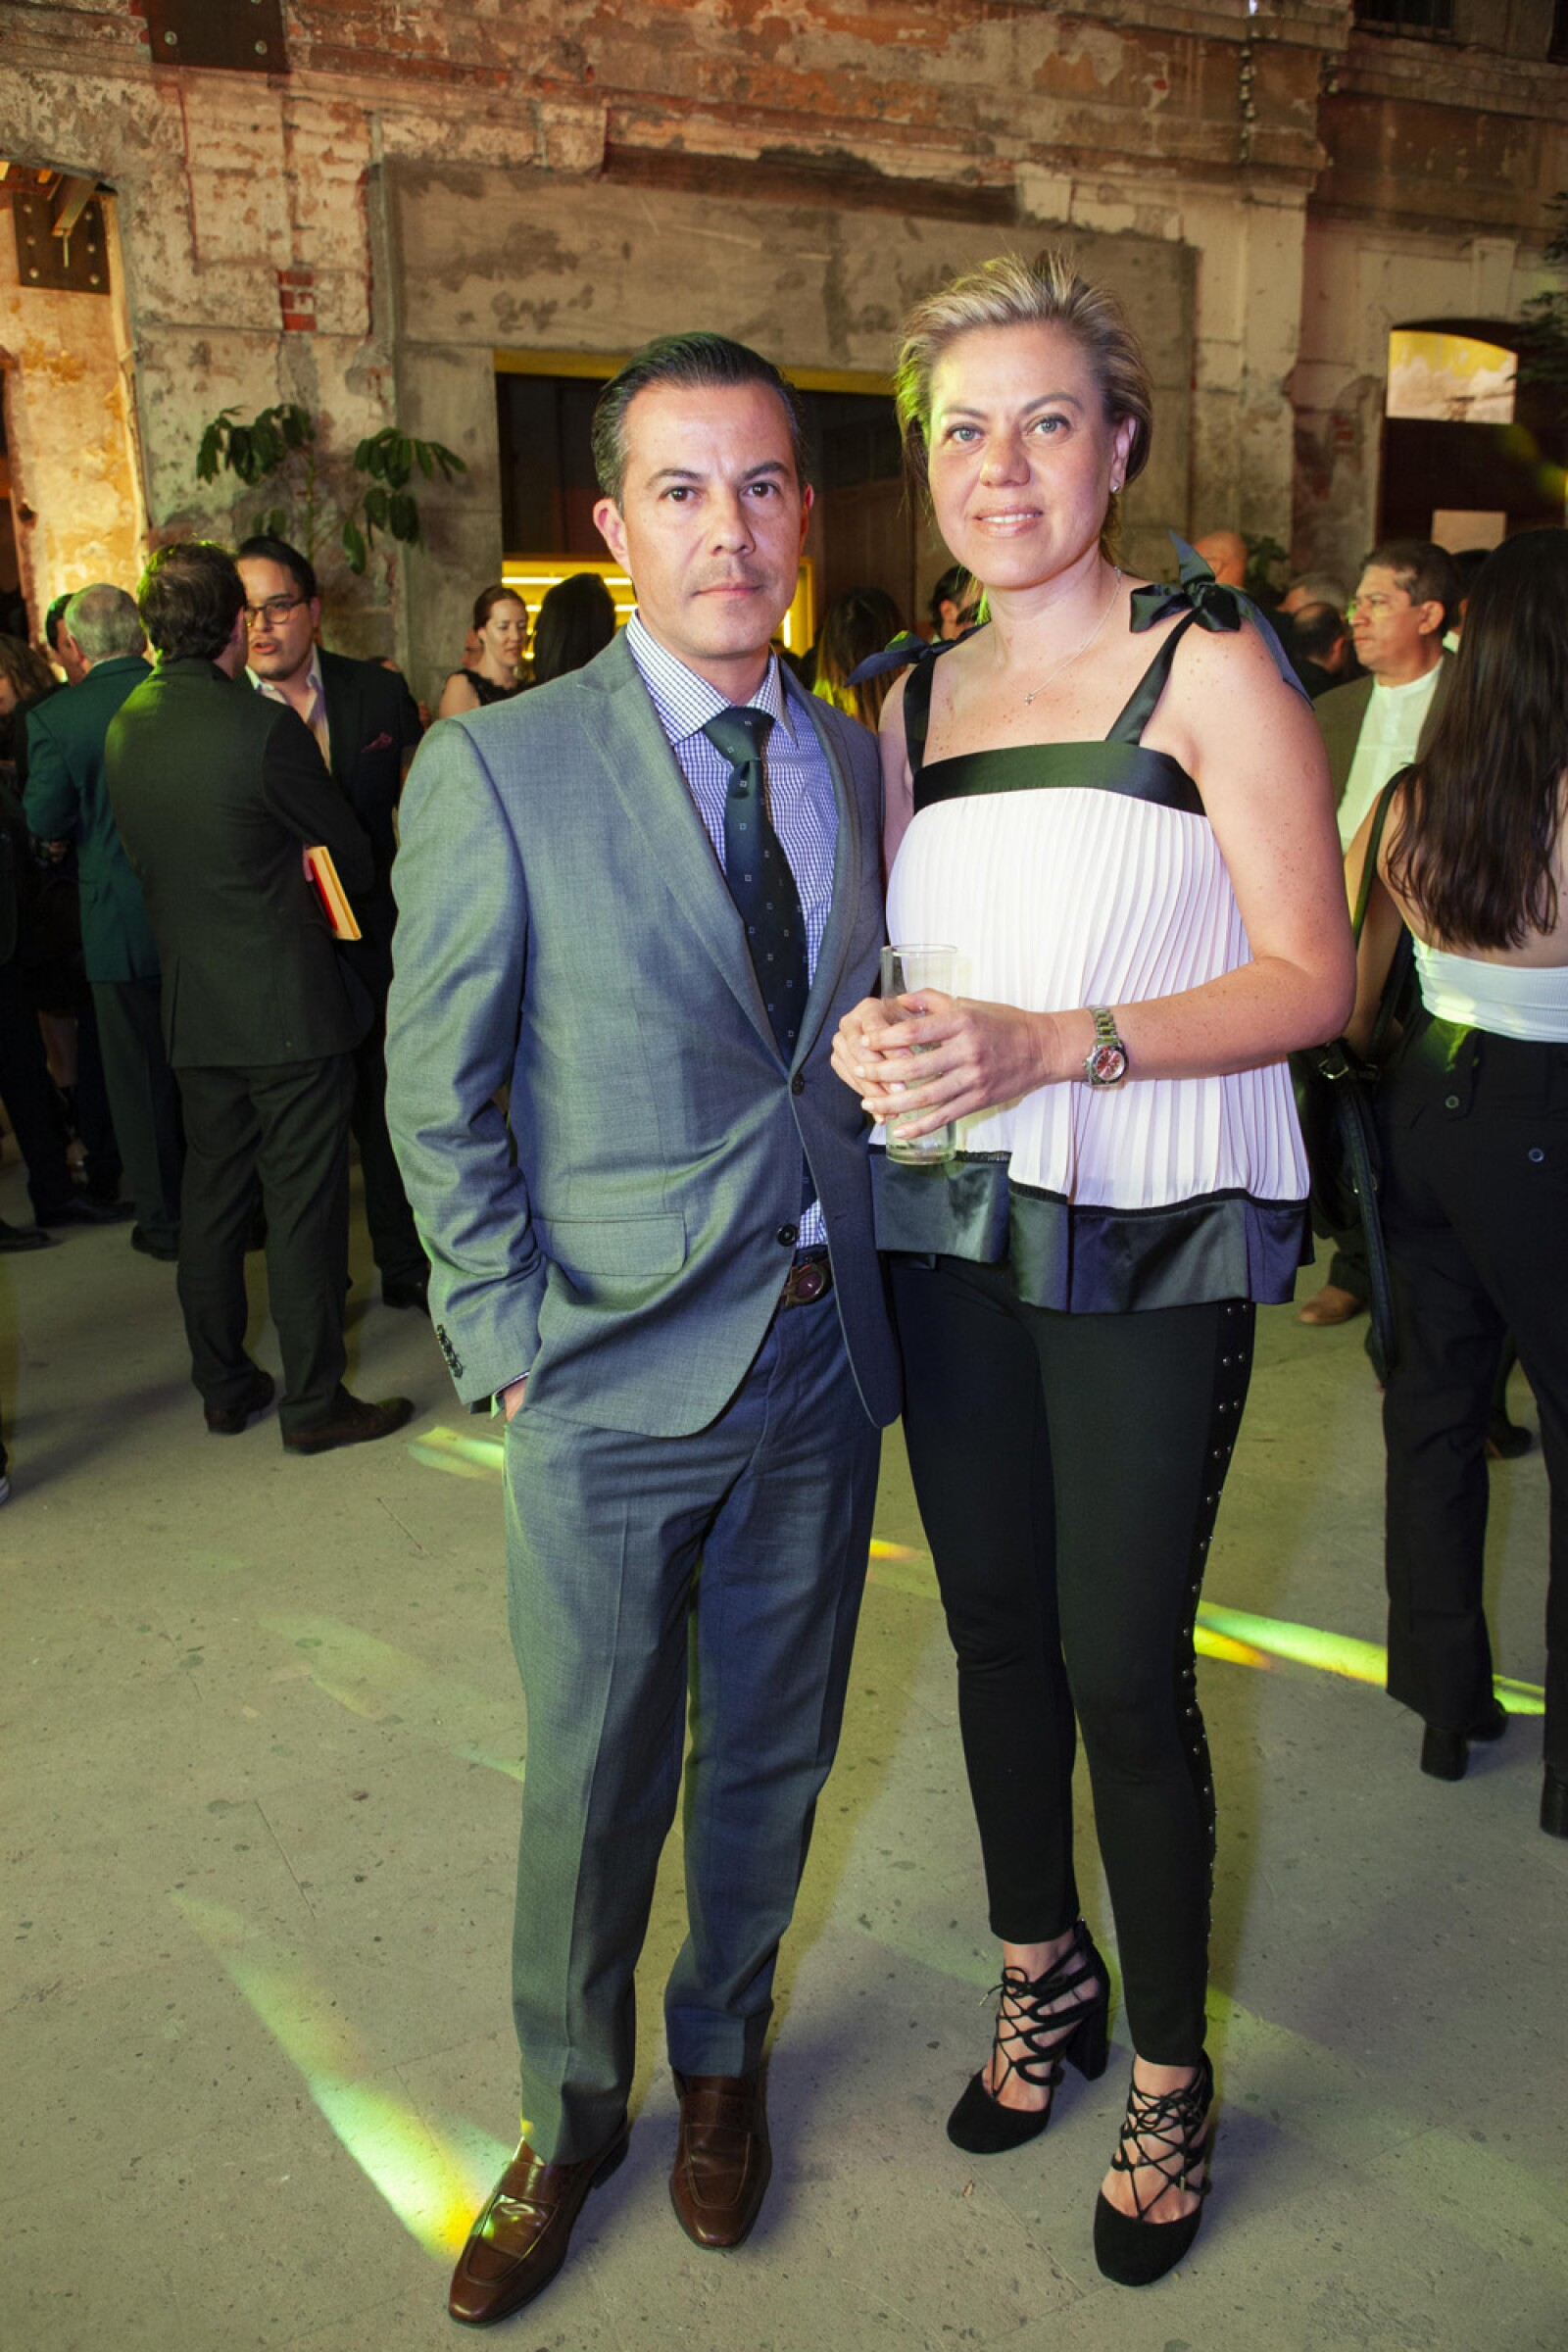 Fernando Cevallos, Fitzia Flores